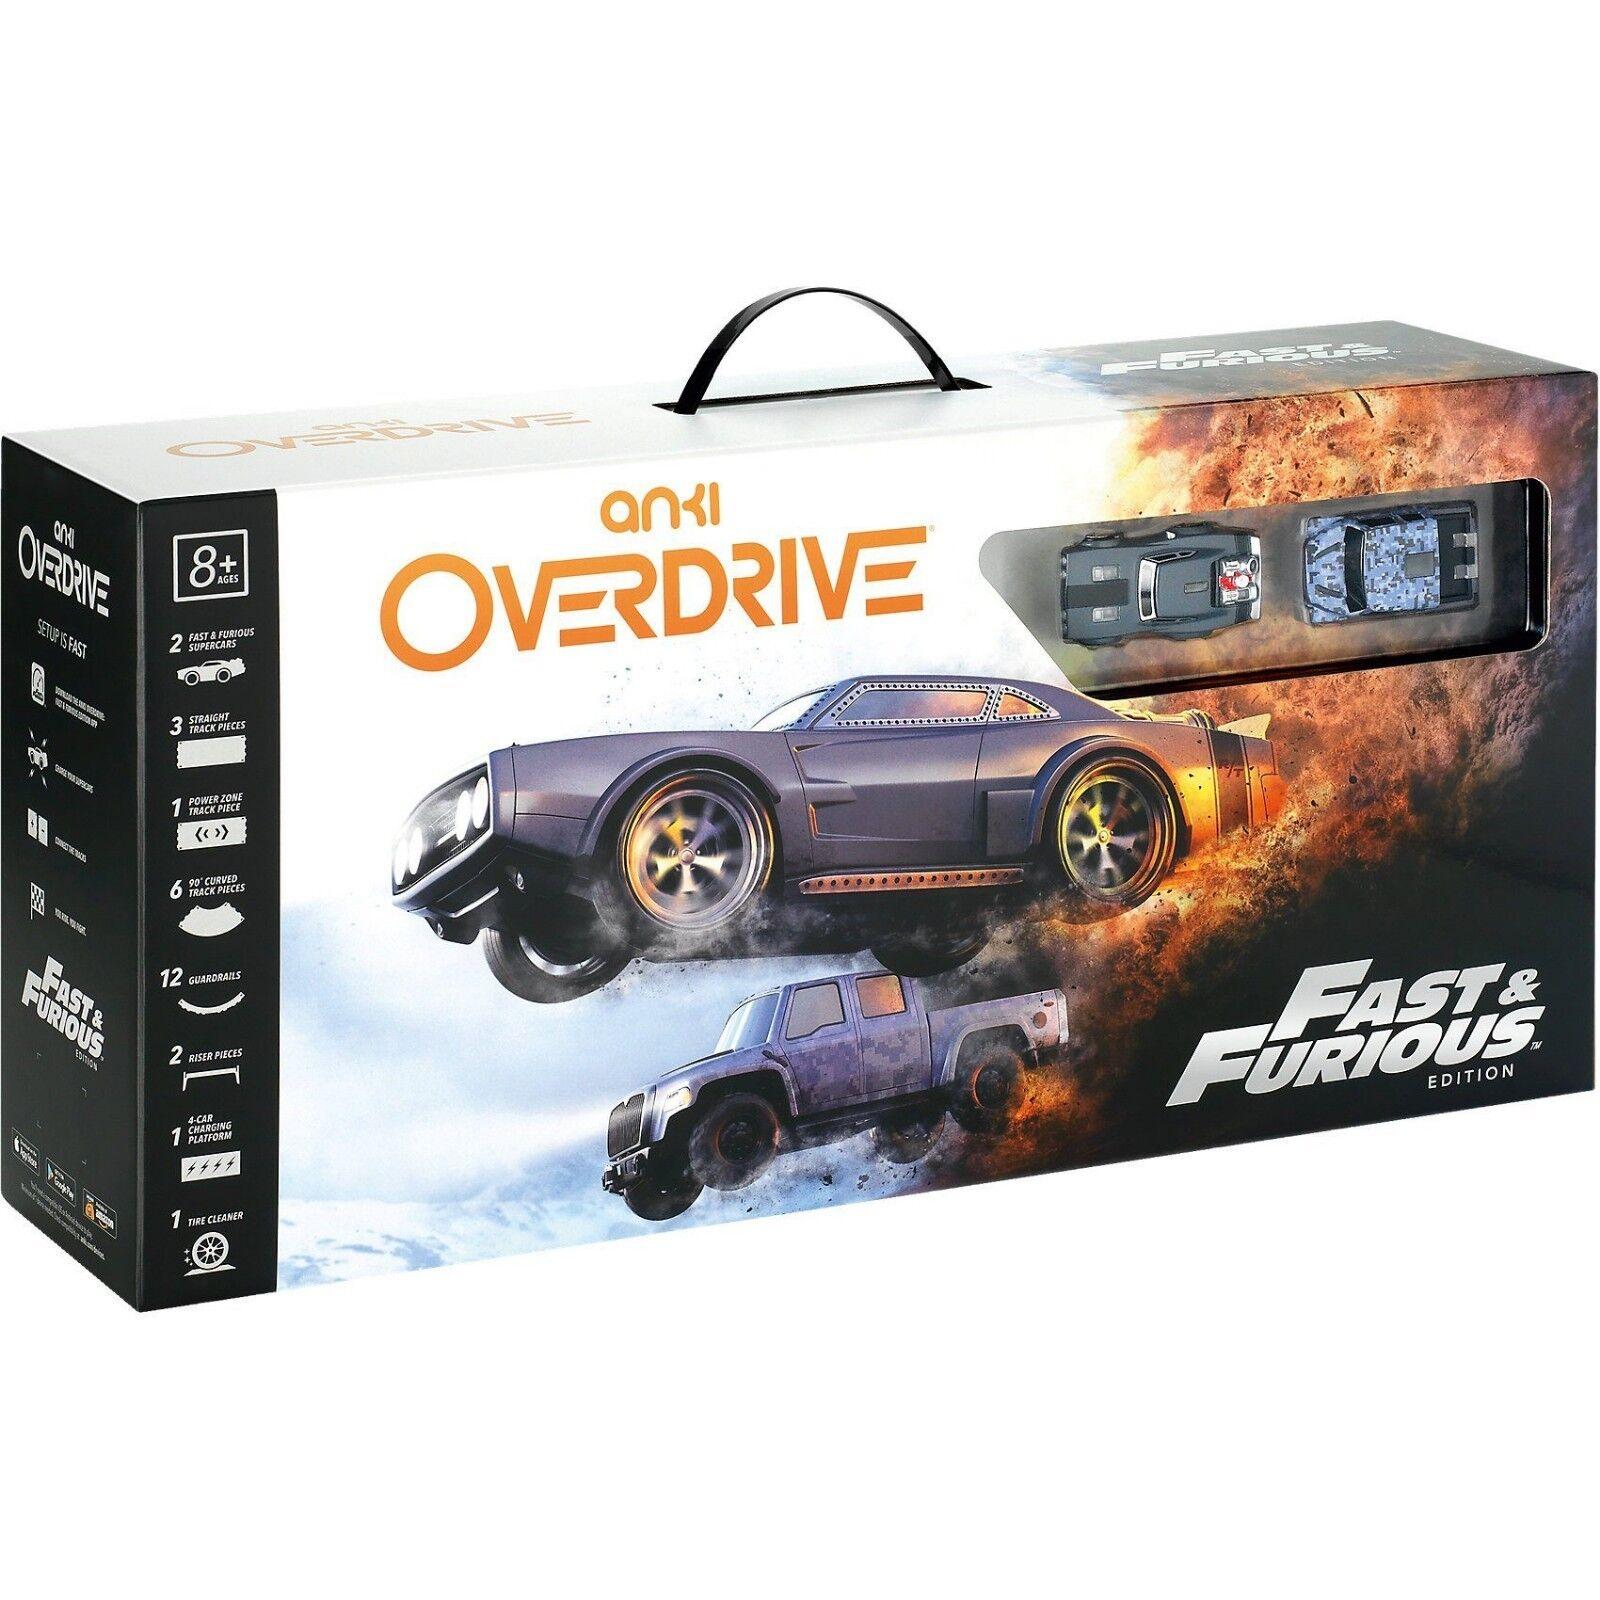 Anki Overdrive Starter Kit (Fast & Furious - Edition) NEU OVP    Mittlere Kosten